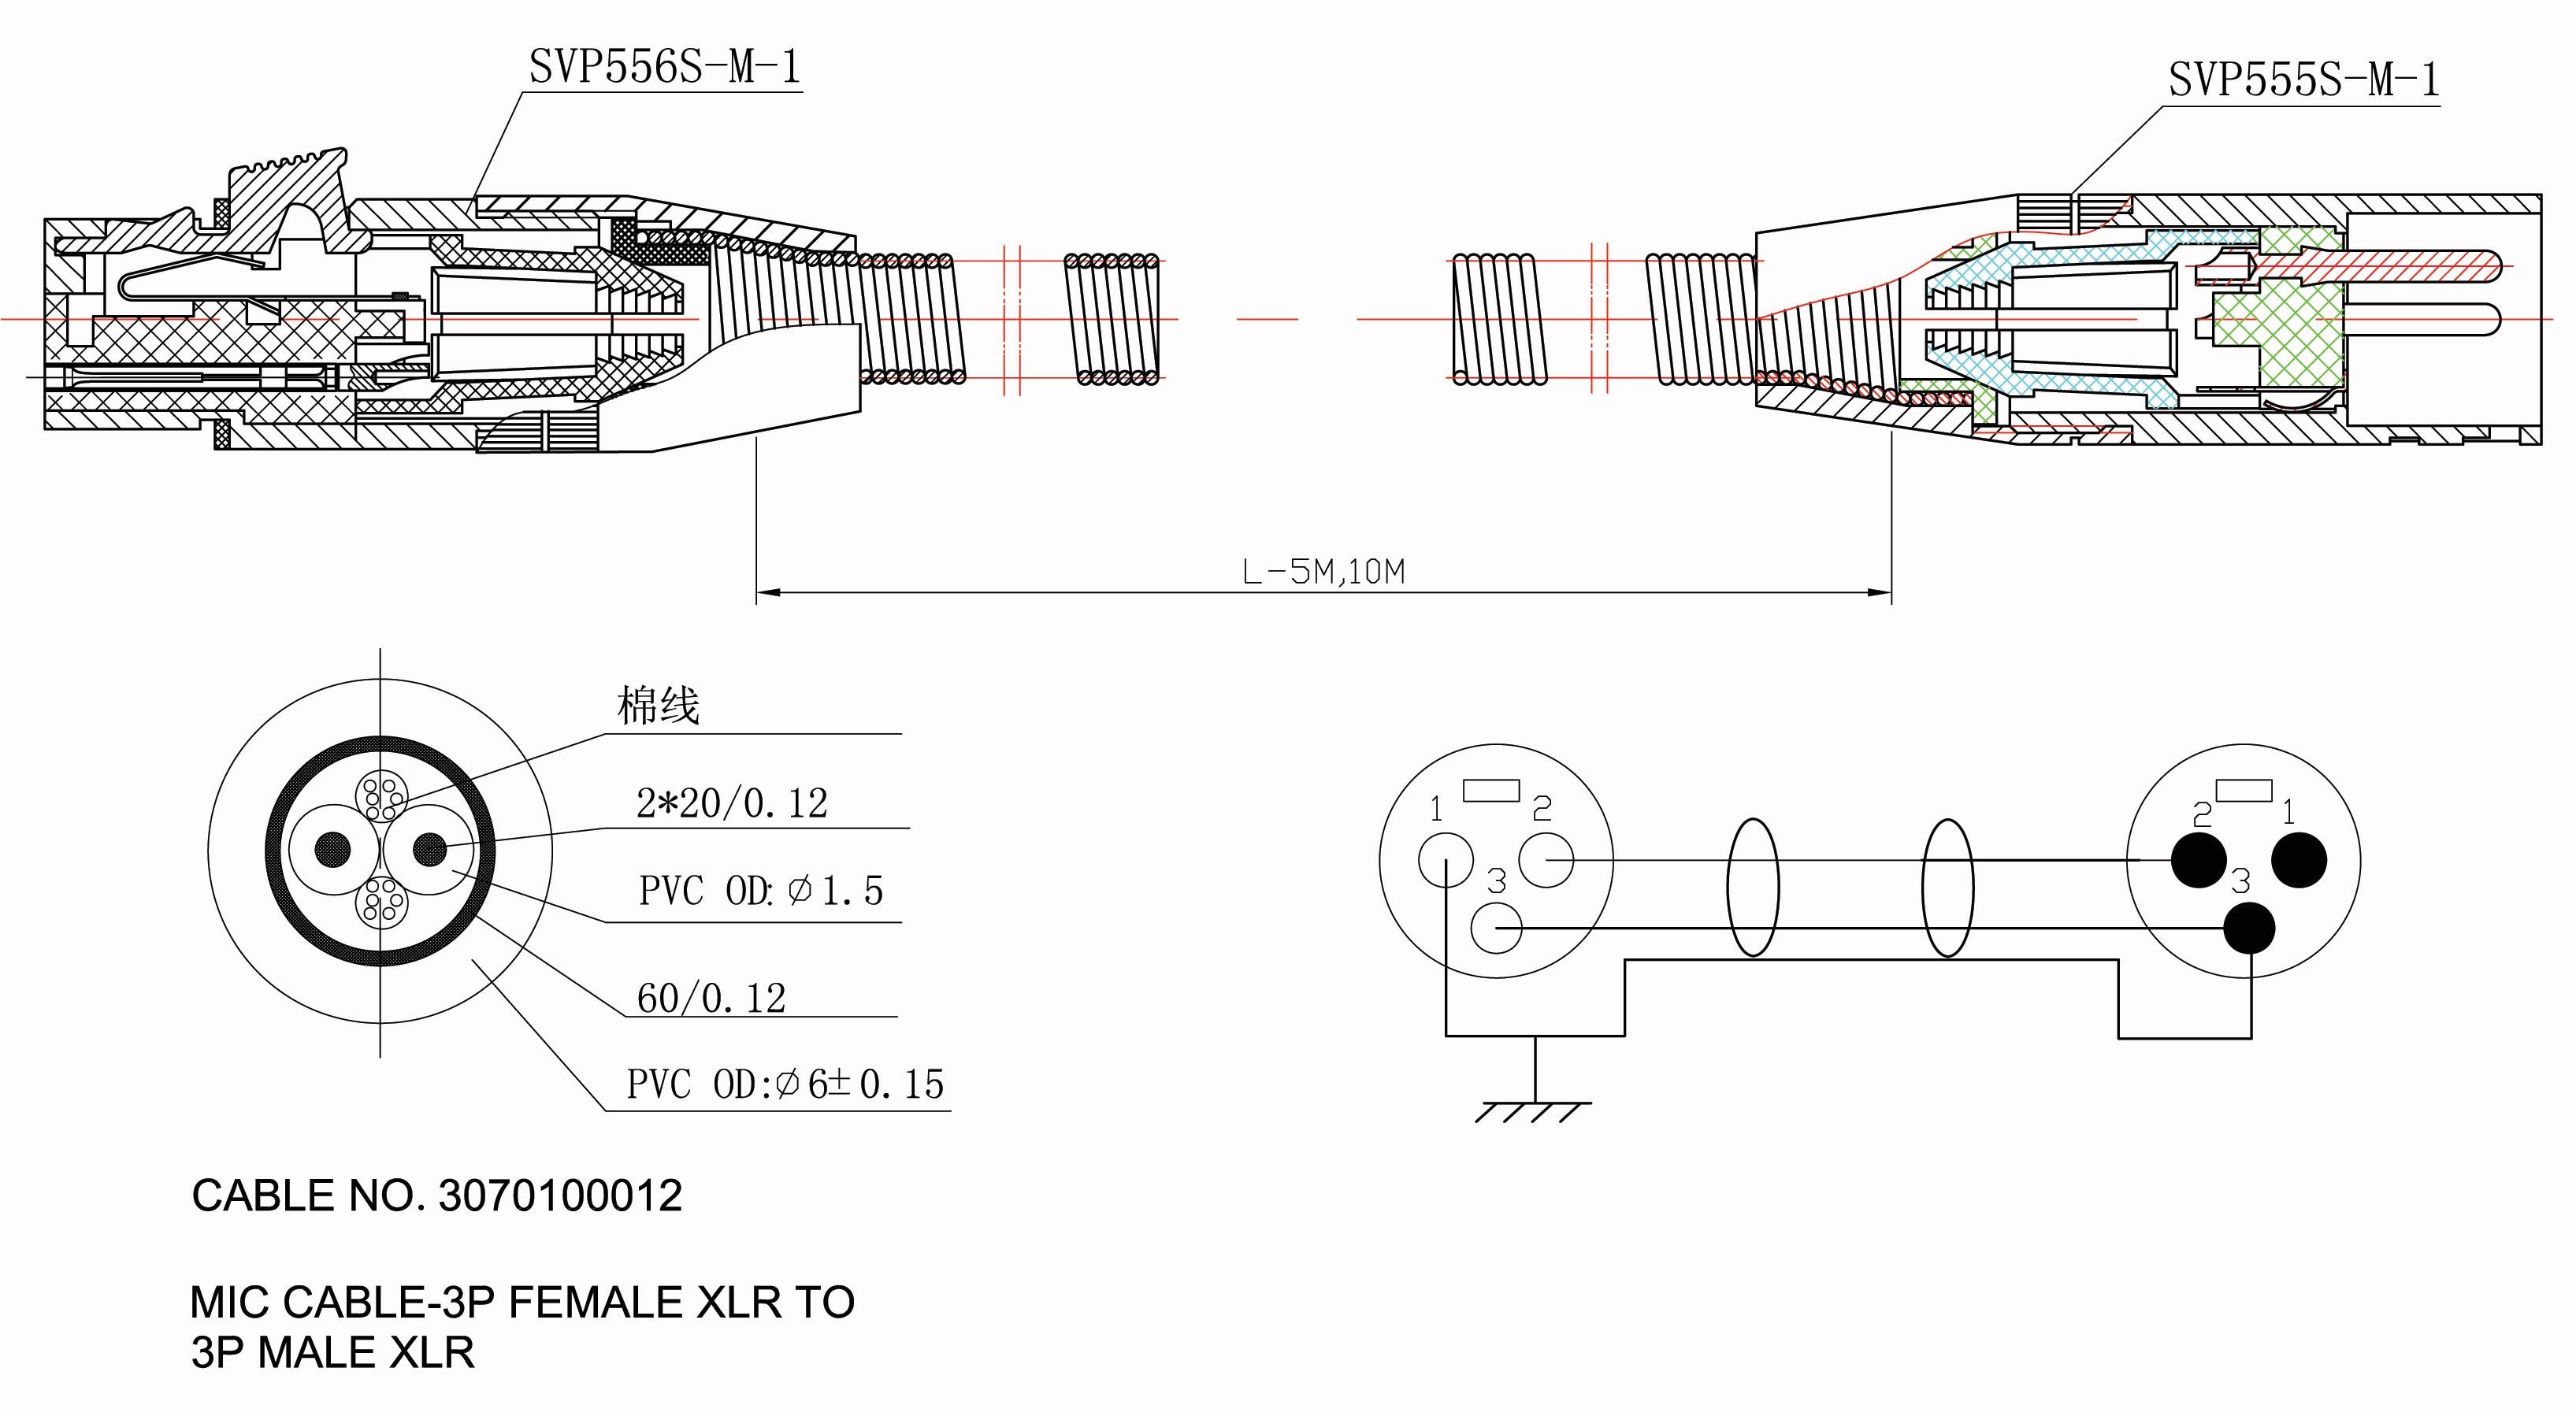 dsc 551 wiring diagram wiring diagram directed alarm wiring diagram elegant wiring diagram car alarm mix